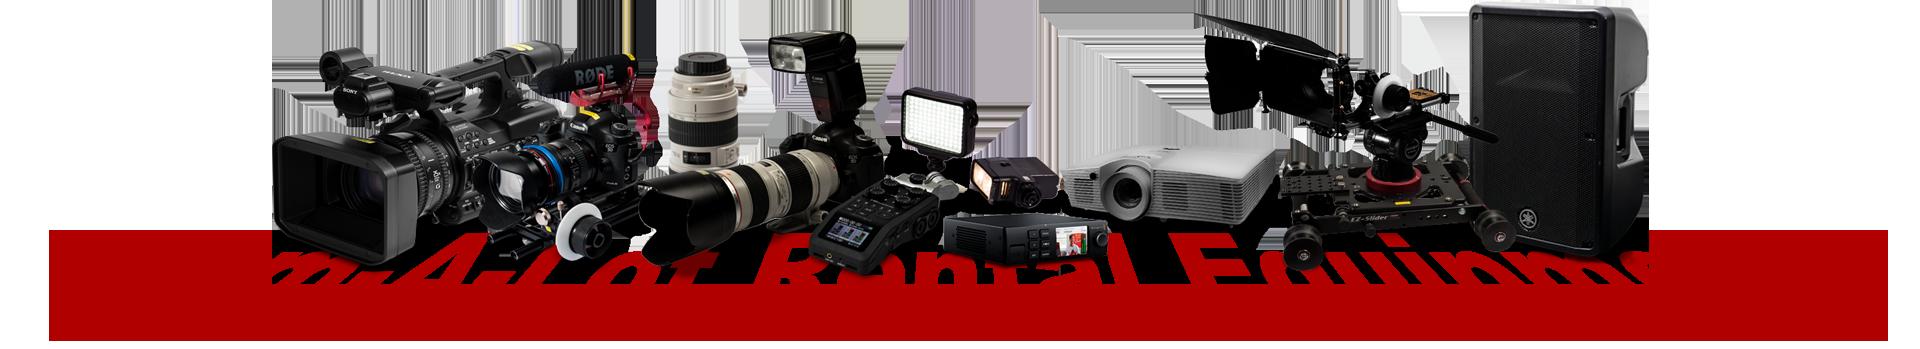 Camalot-rental-Equipment